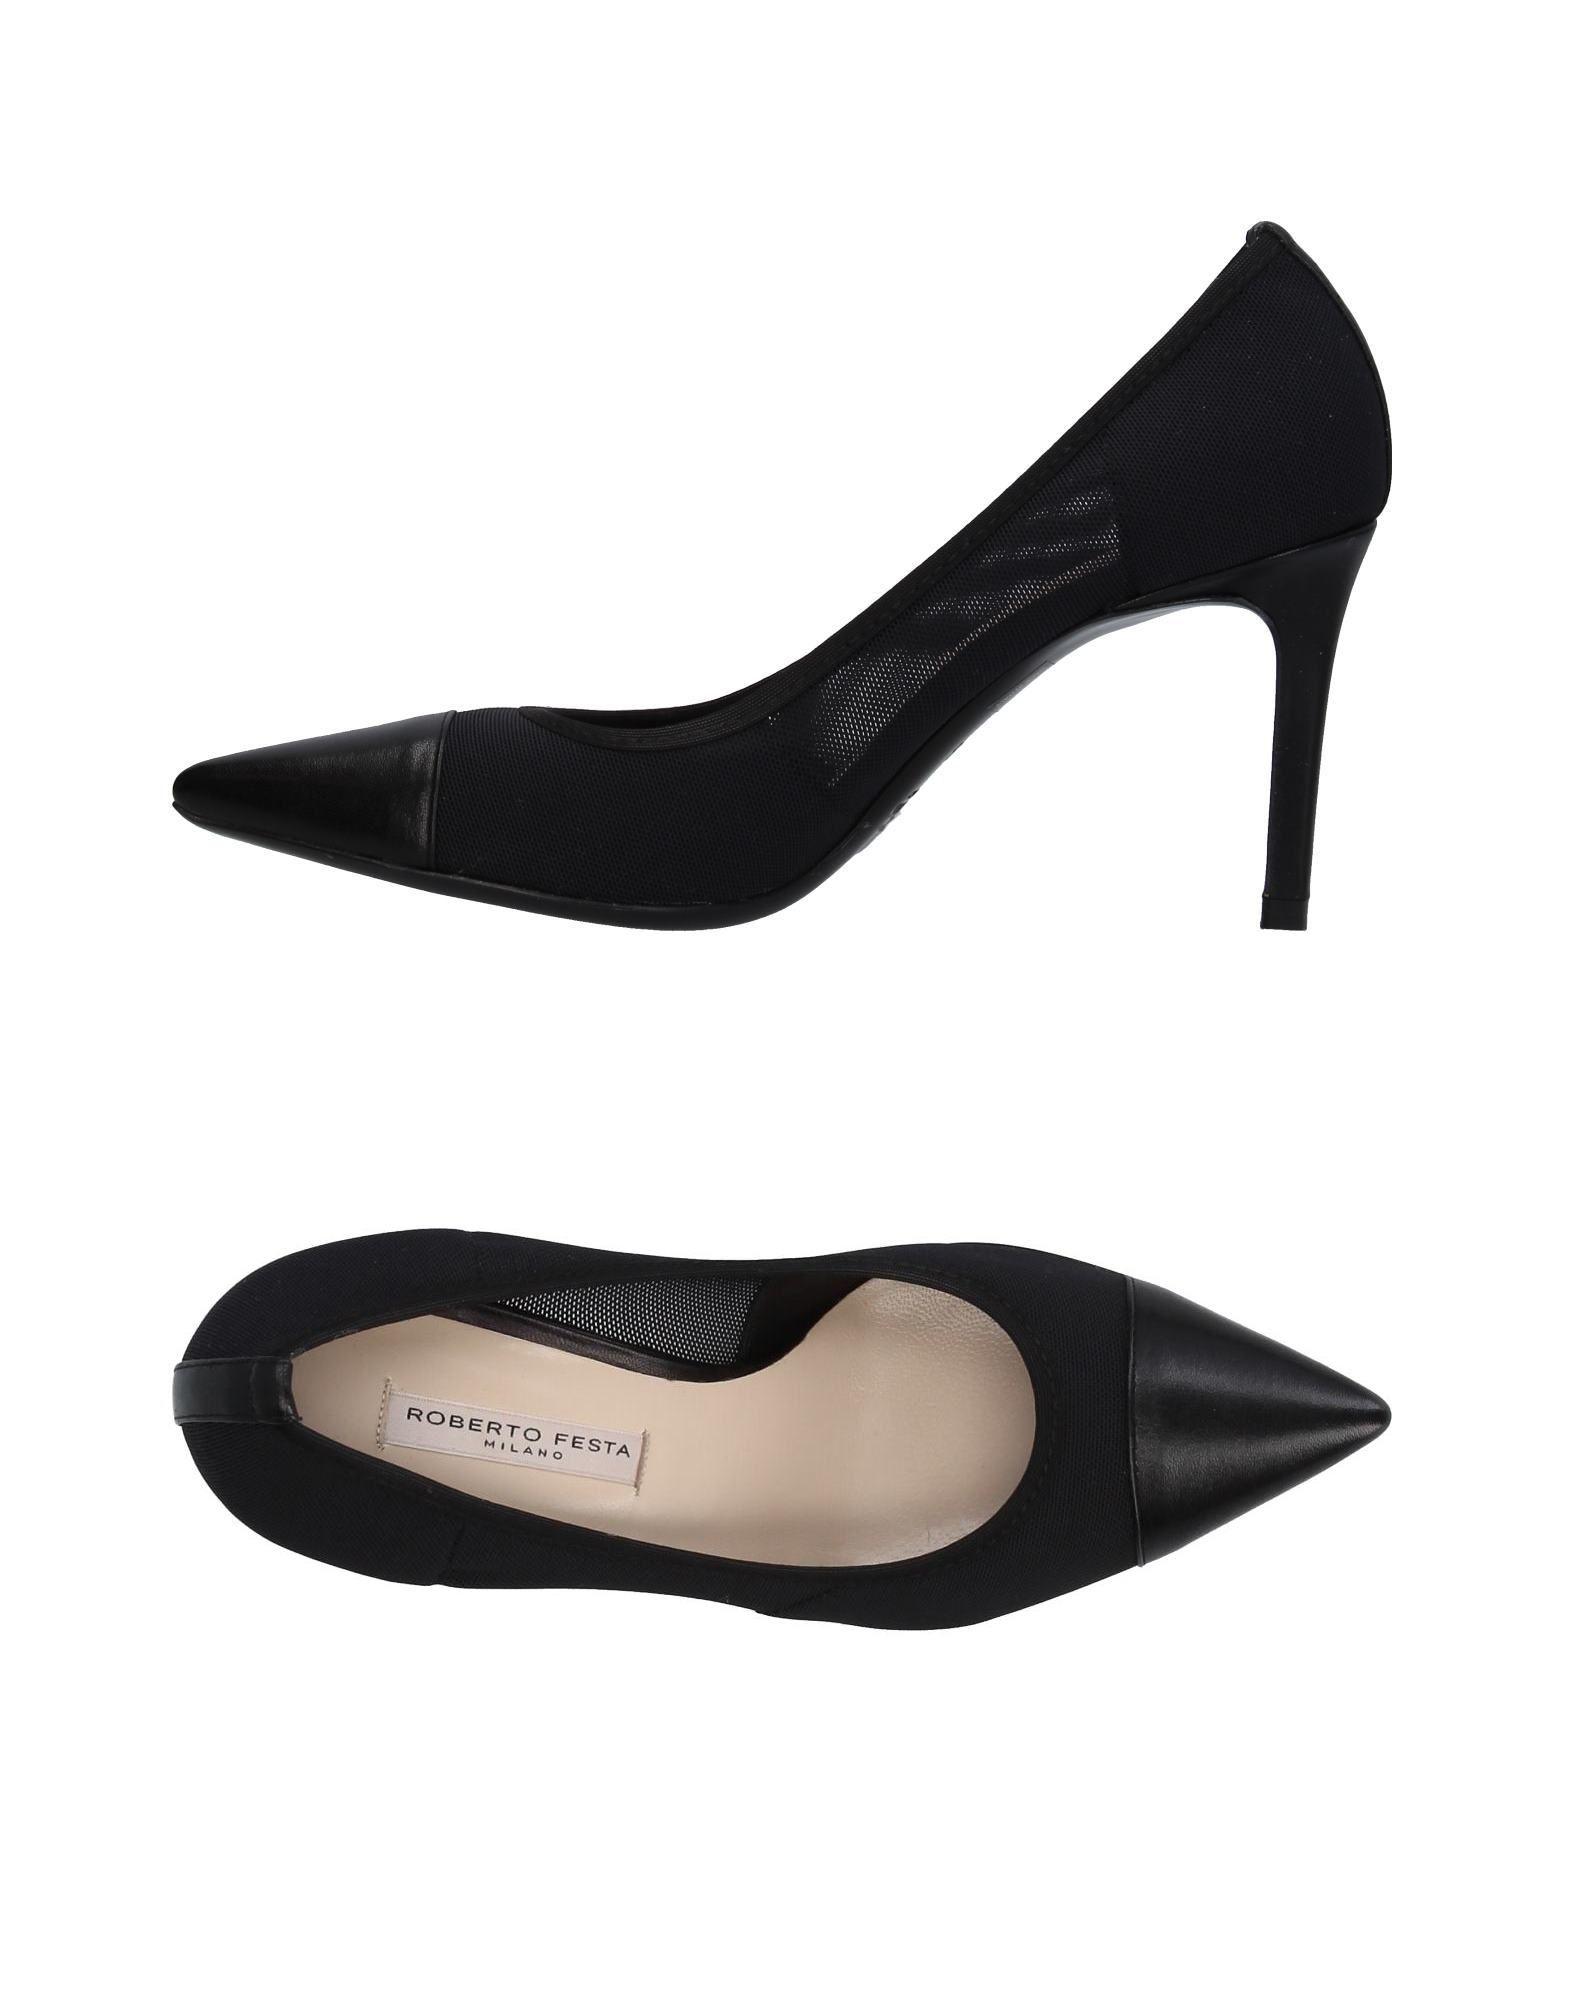 Roberto Festa Pumps Damen  11404123GP Gute Qualität beliebte Schuhe